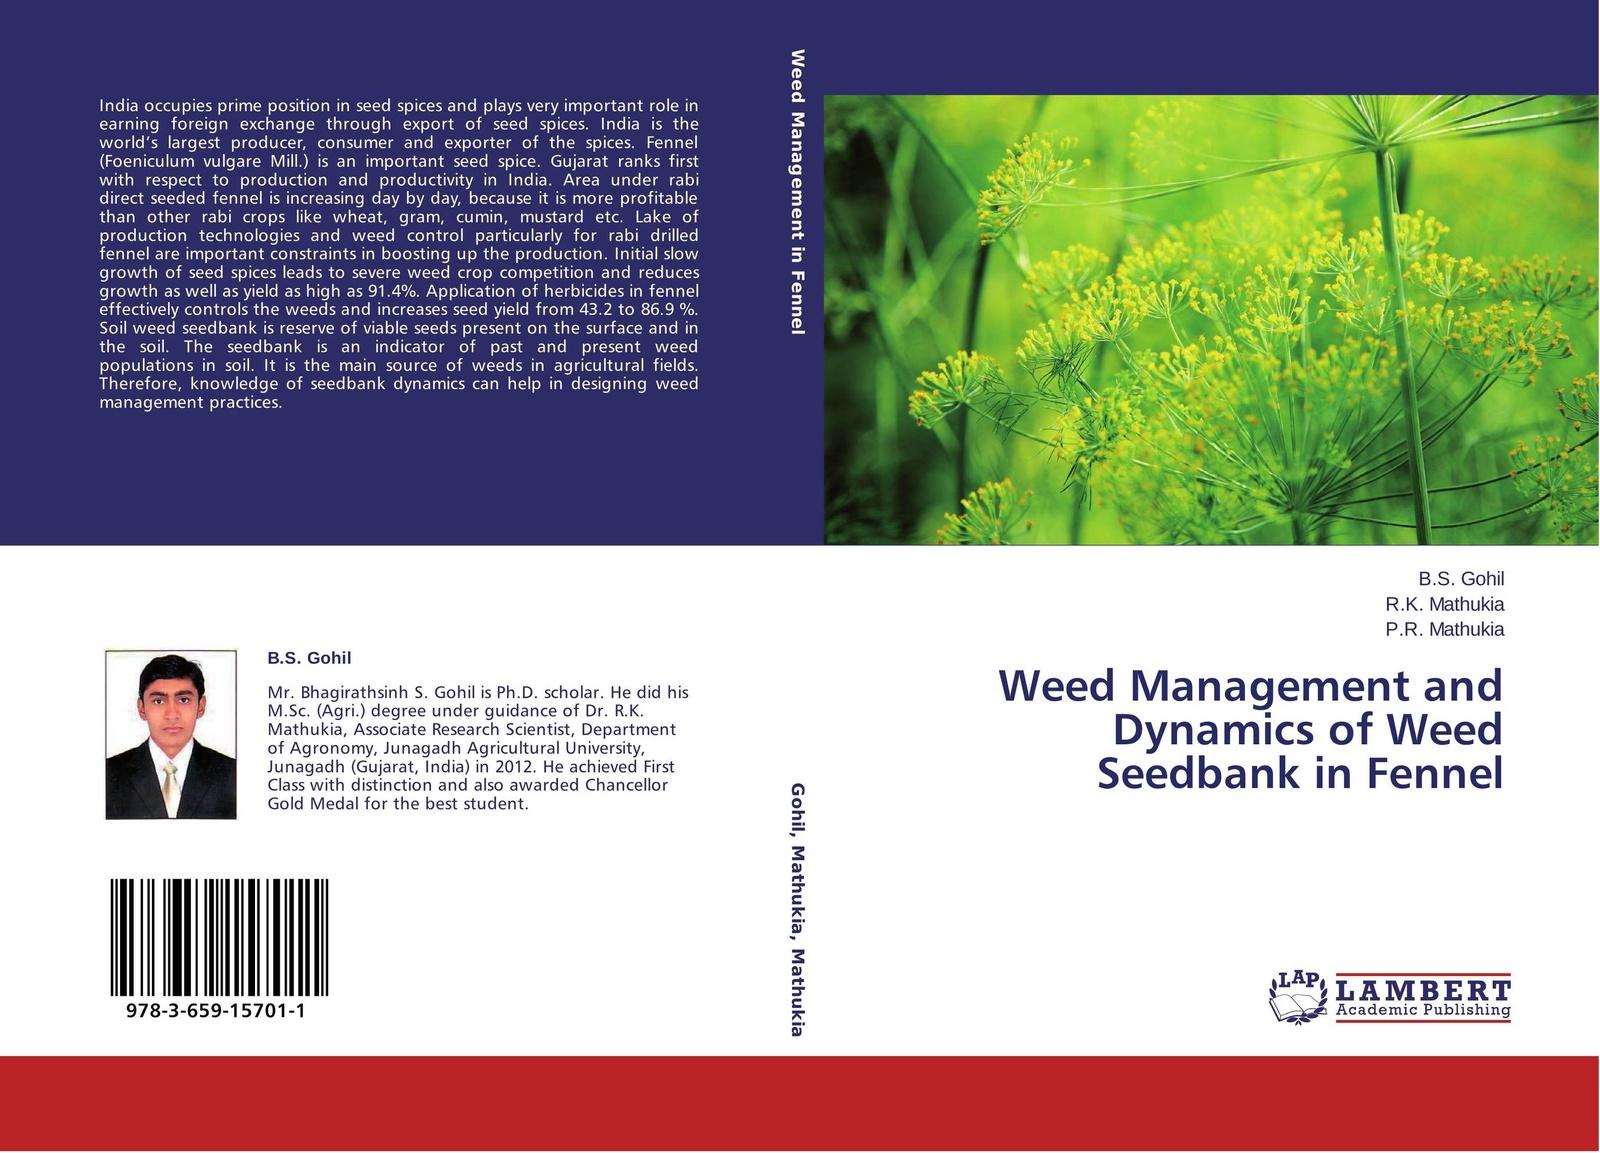 B.S. Gohil,R.K. Mathukia and P.R. Mathukia Weed Management and Dynamics of Weed Seedbank in Fennel shakuntala meena r k mathukia and v d khanpara weed management in summer greengram vigna radiata l page 3